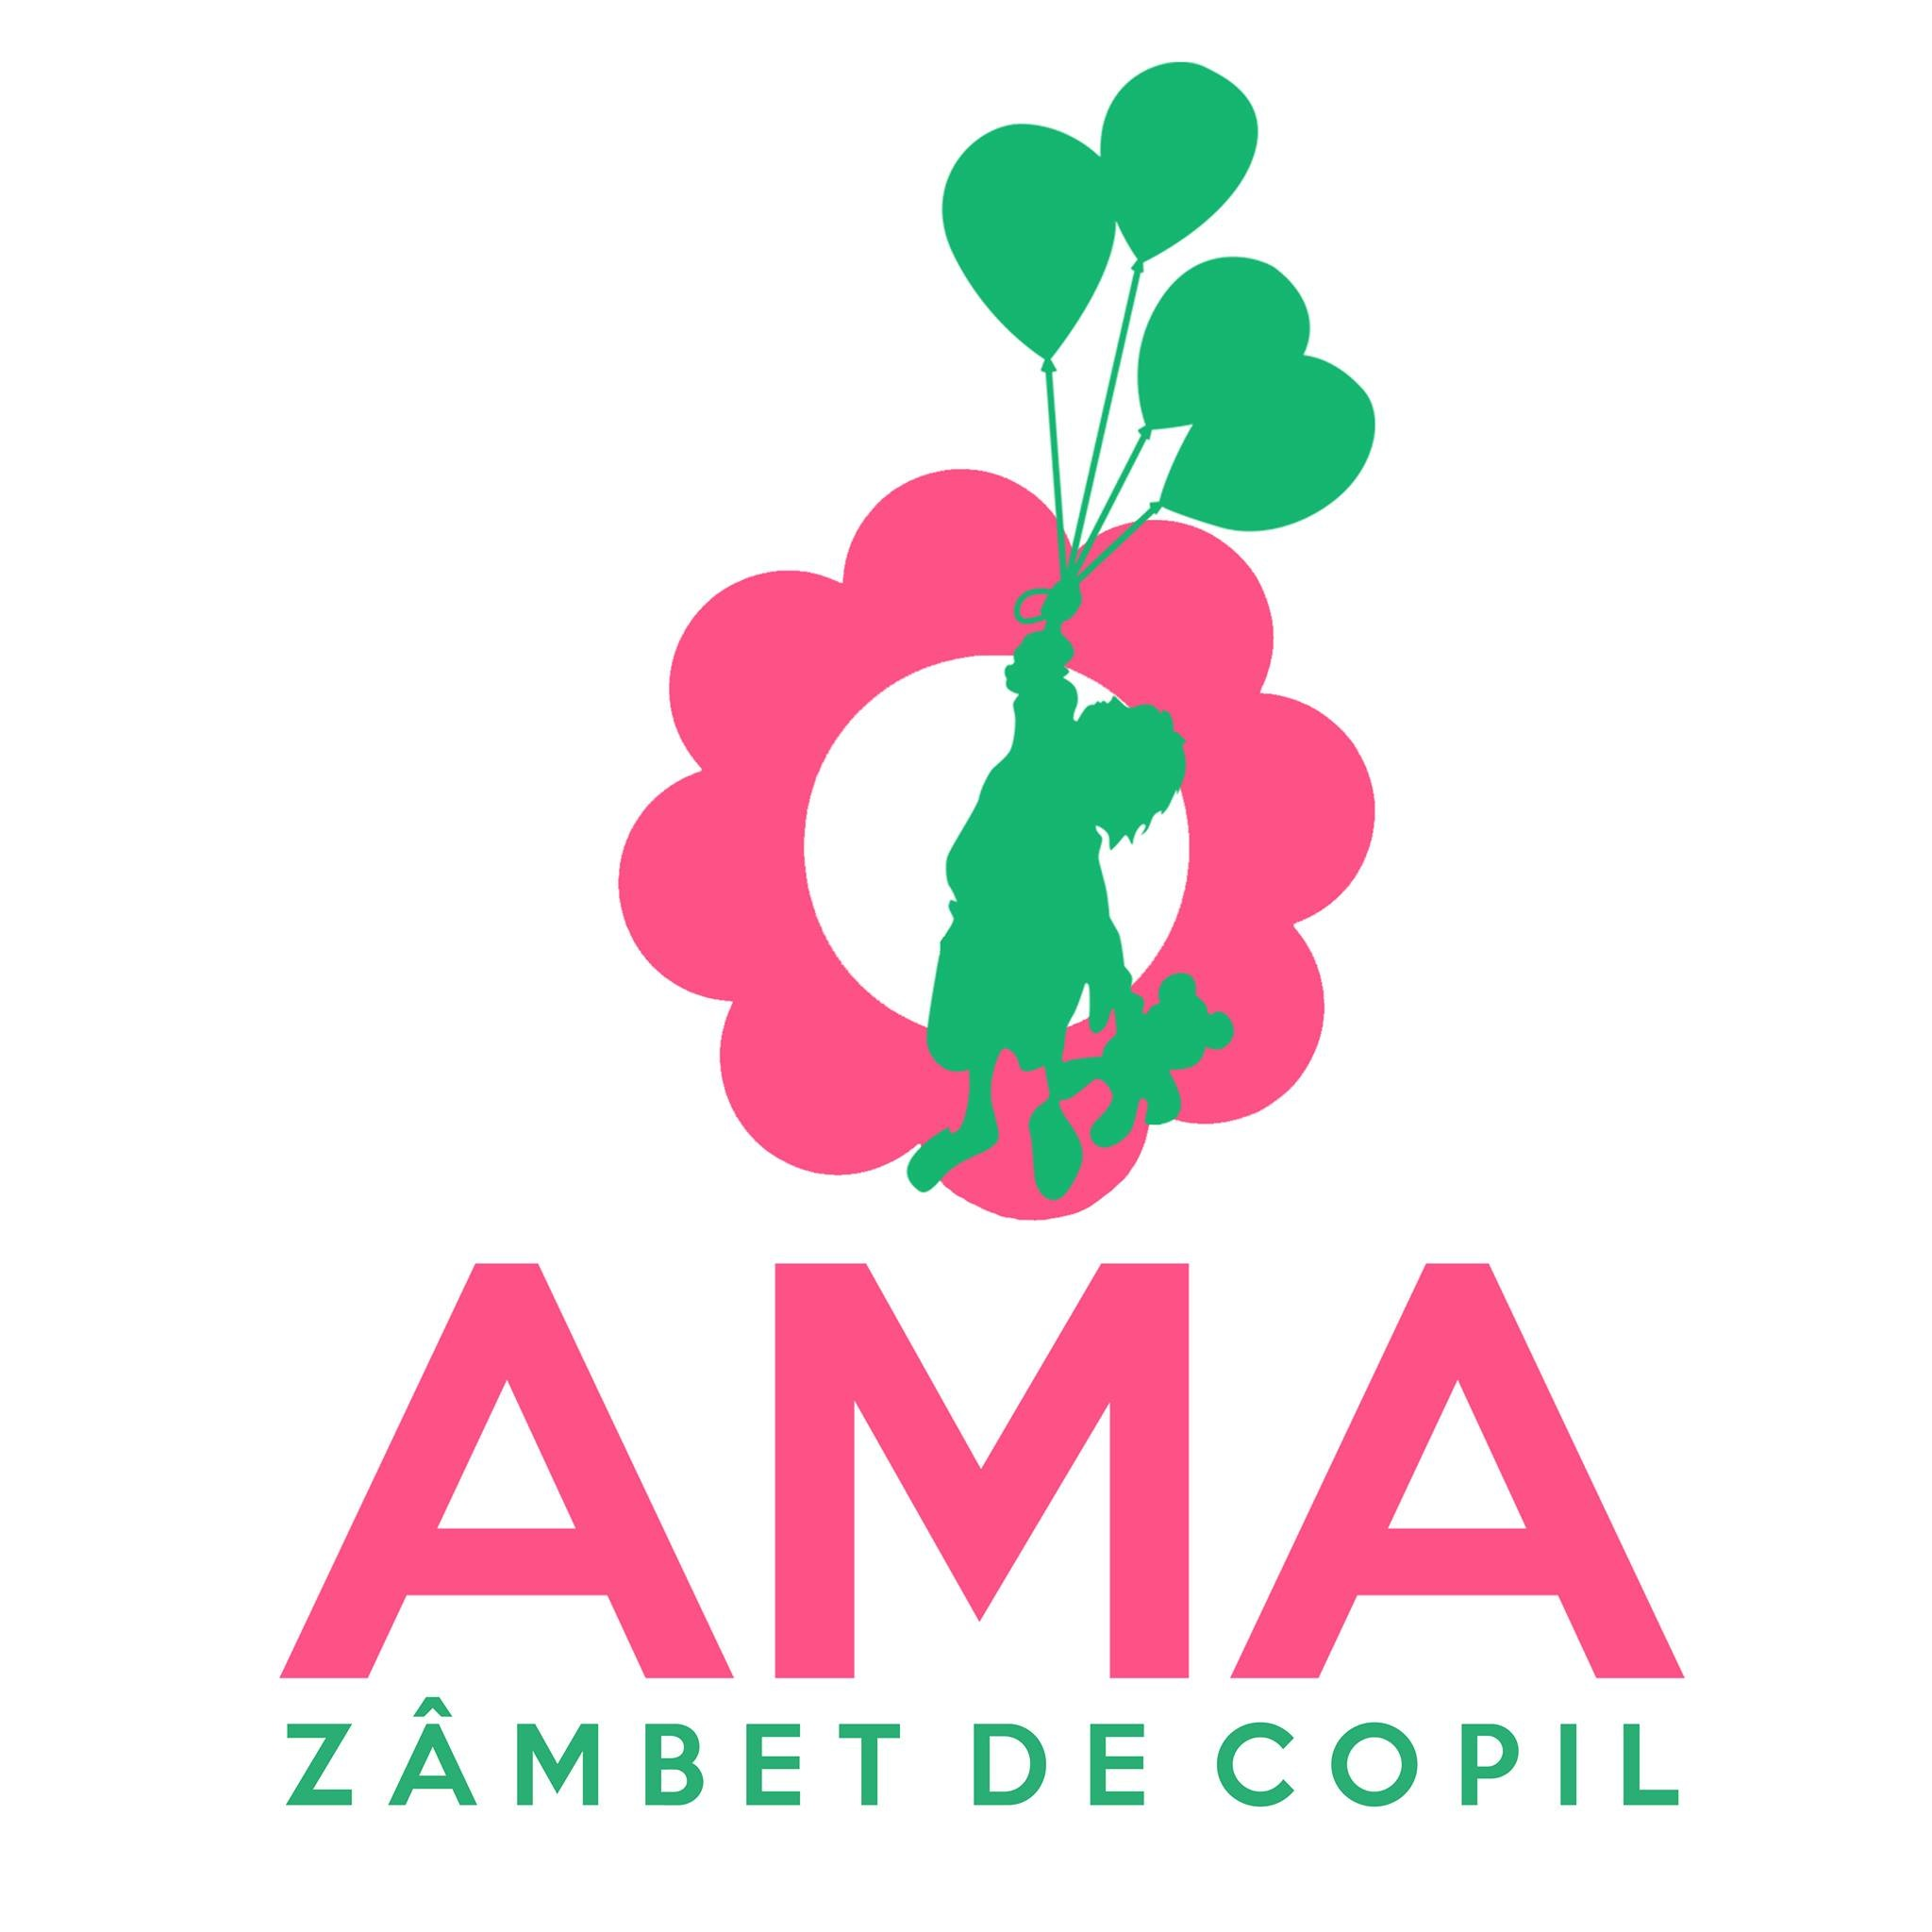 AMA ZAMBET DE COPIL logo